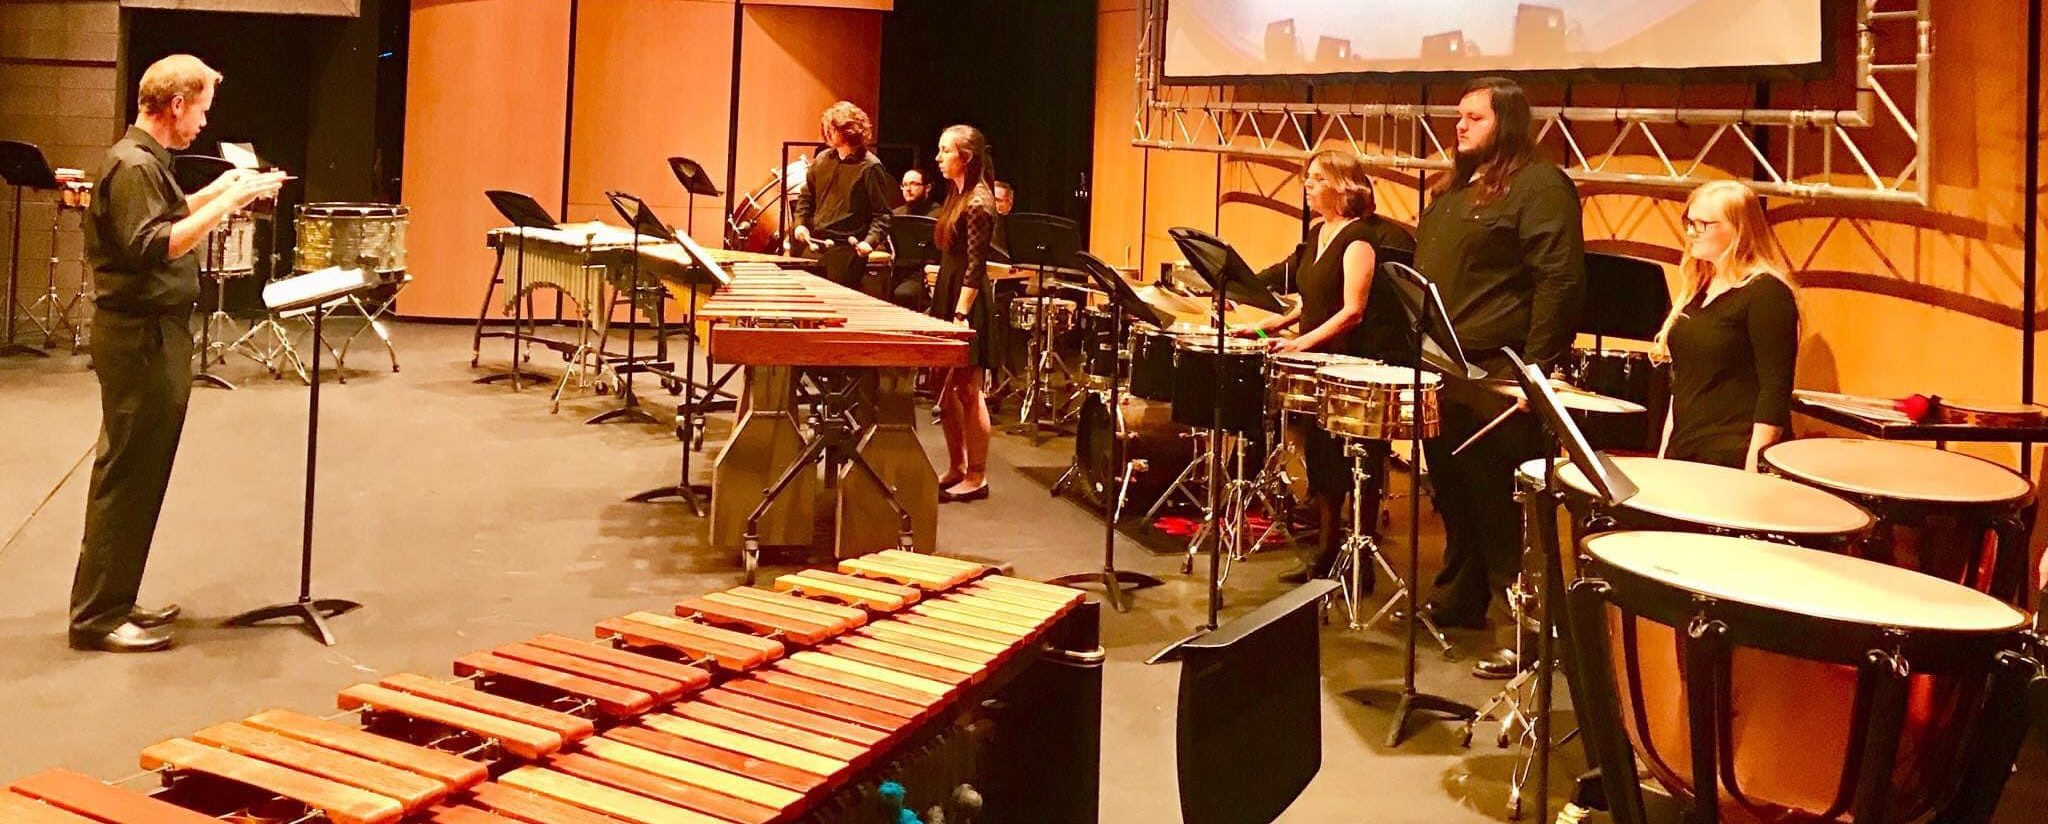 percussion program image